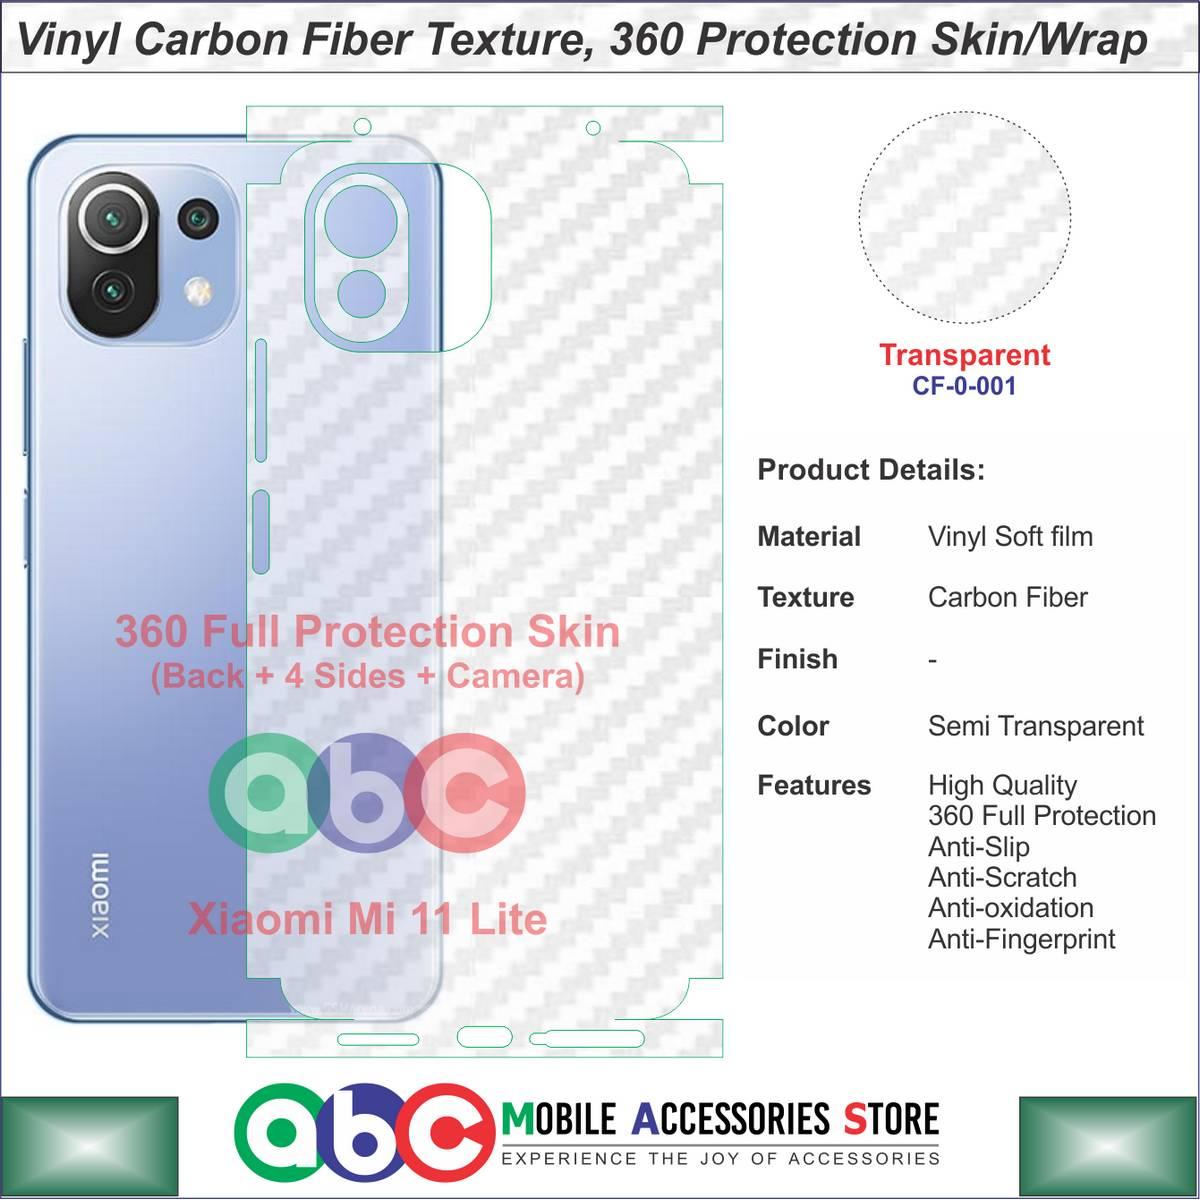 Xiaomi Mi 11 Lite , 360 Full Protection Vinyl Plain / Carbon Fiber / Leather Textures Skin for Mi11Lite